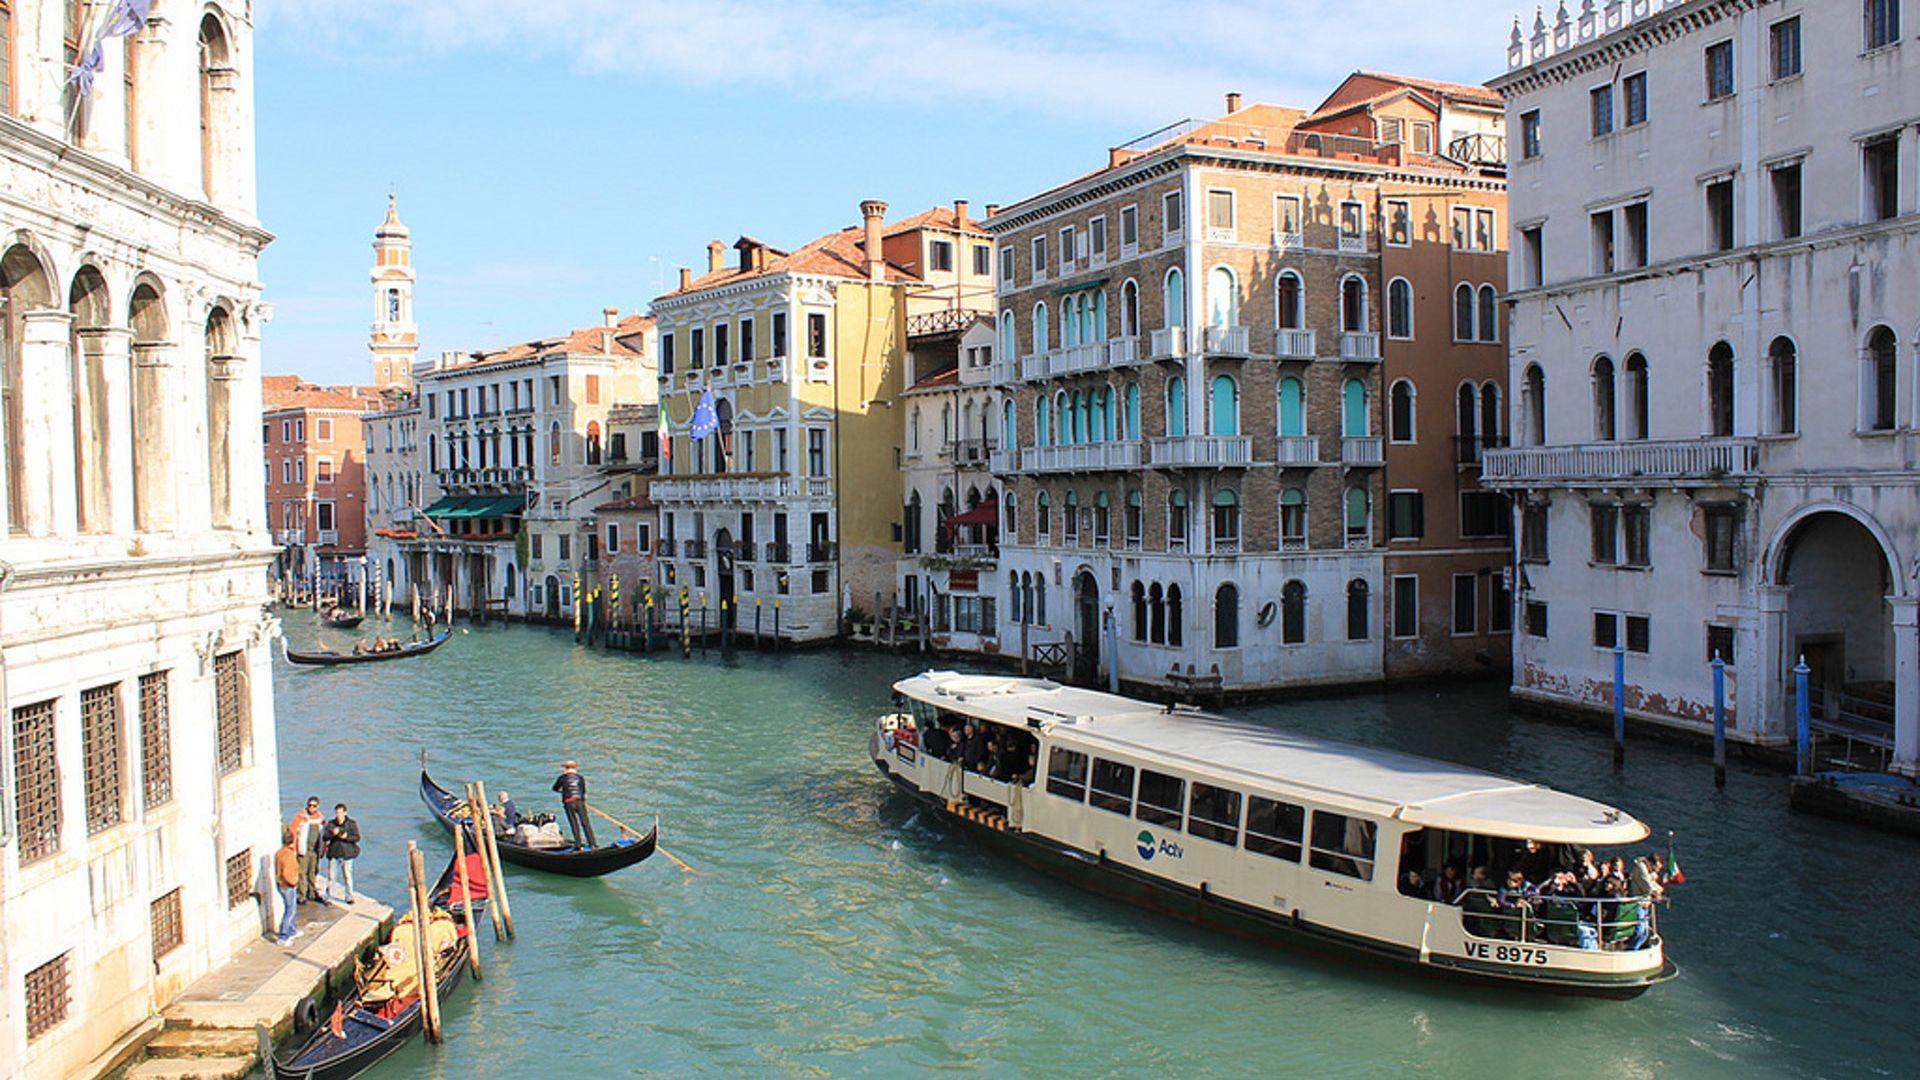 Public transport in Venice